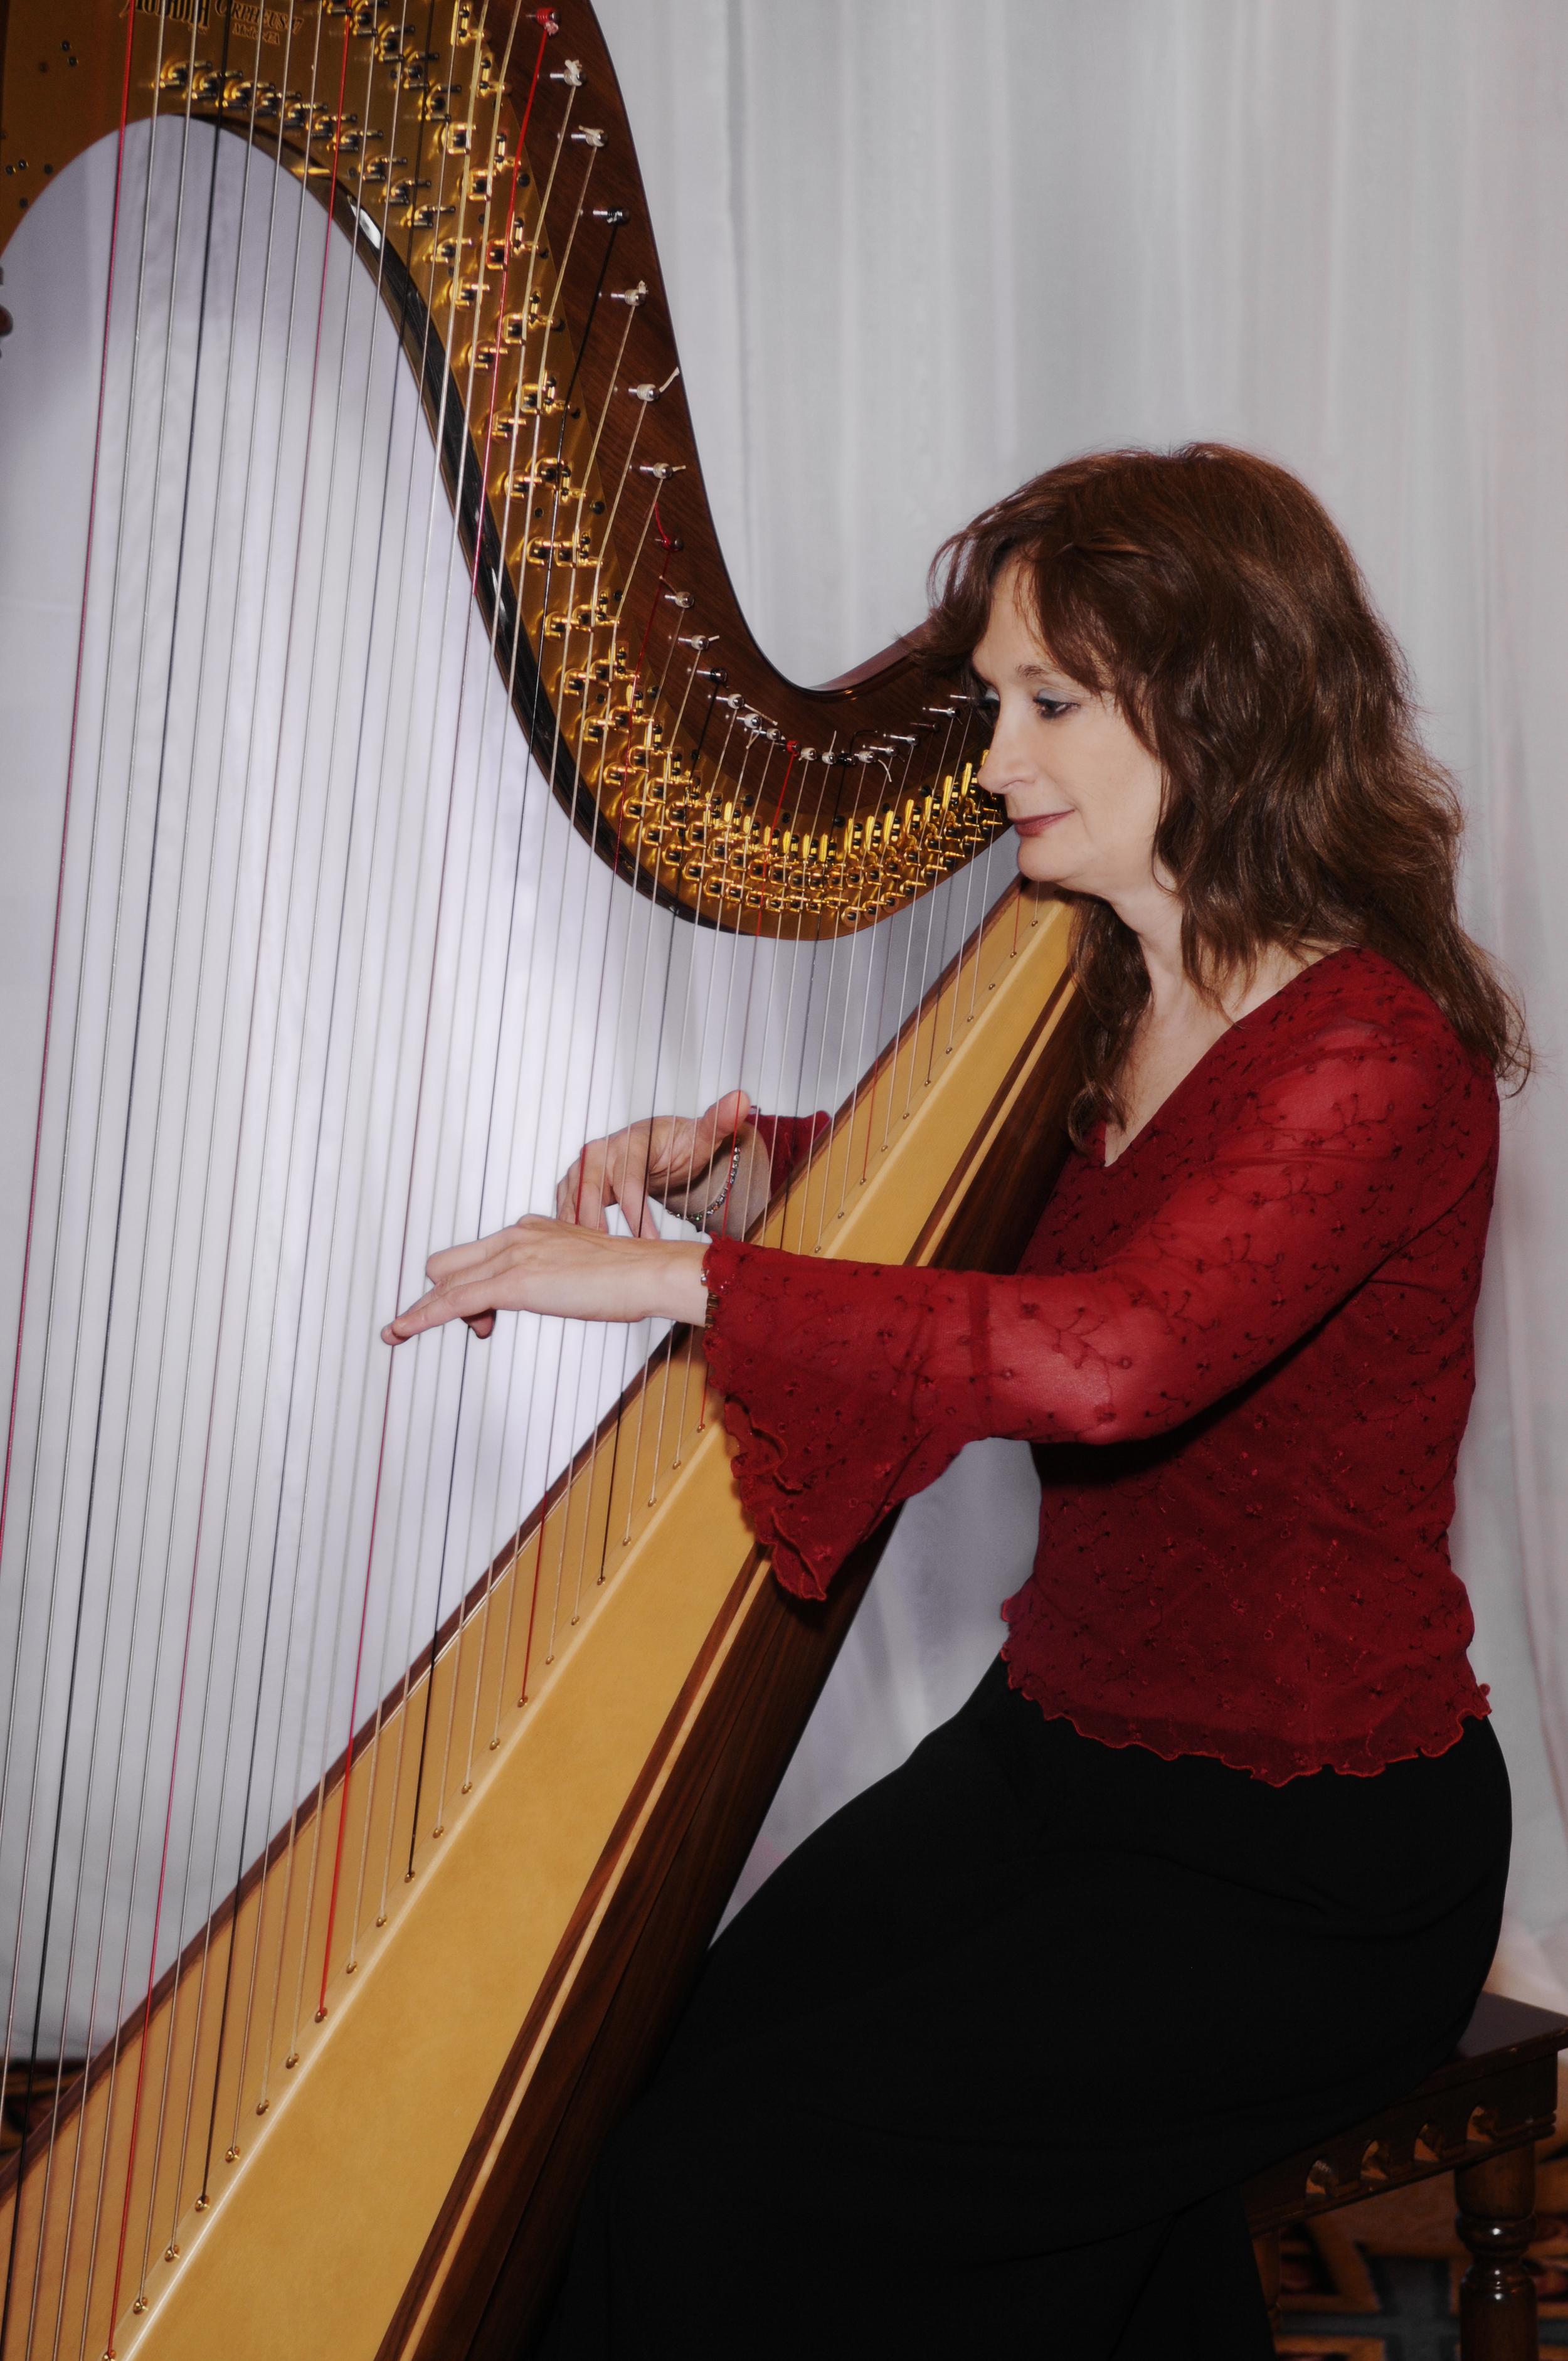 Erica Schultz at the harp